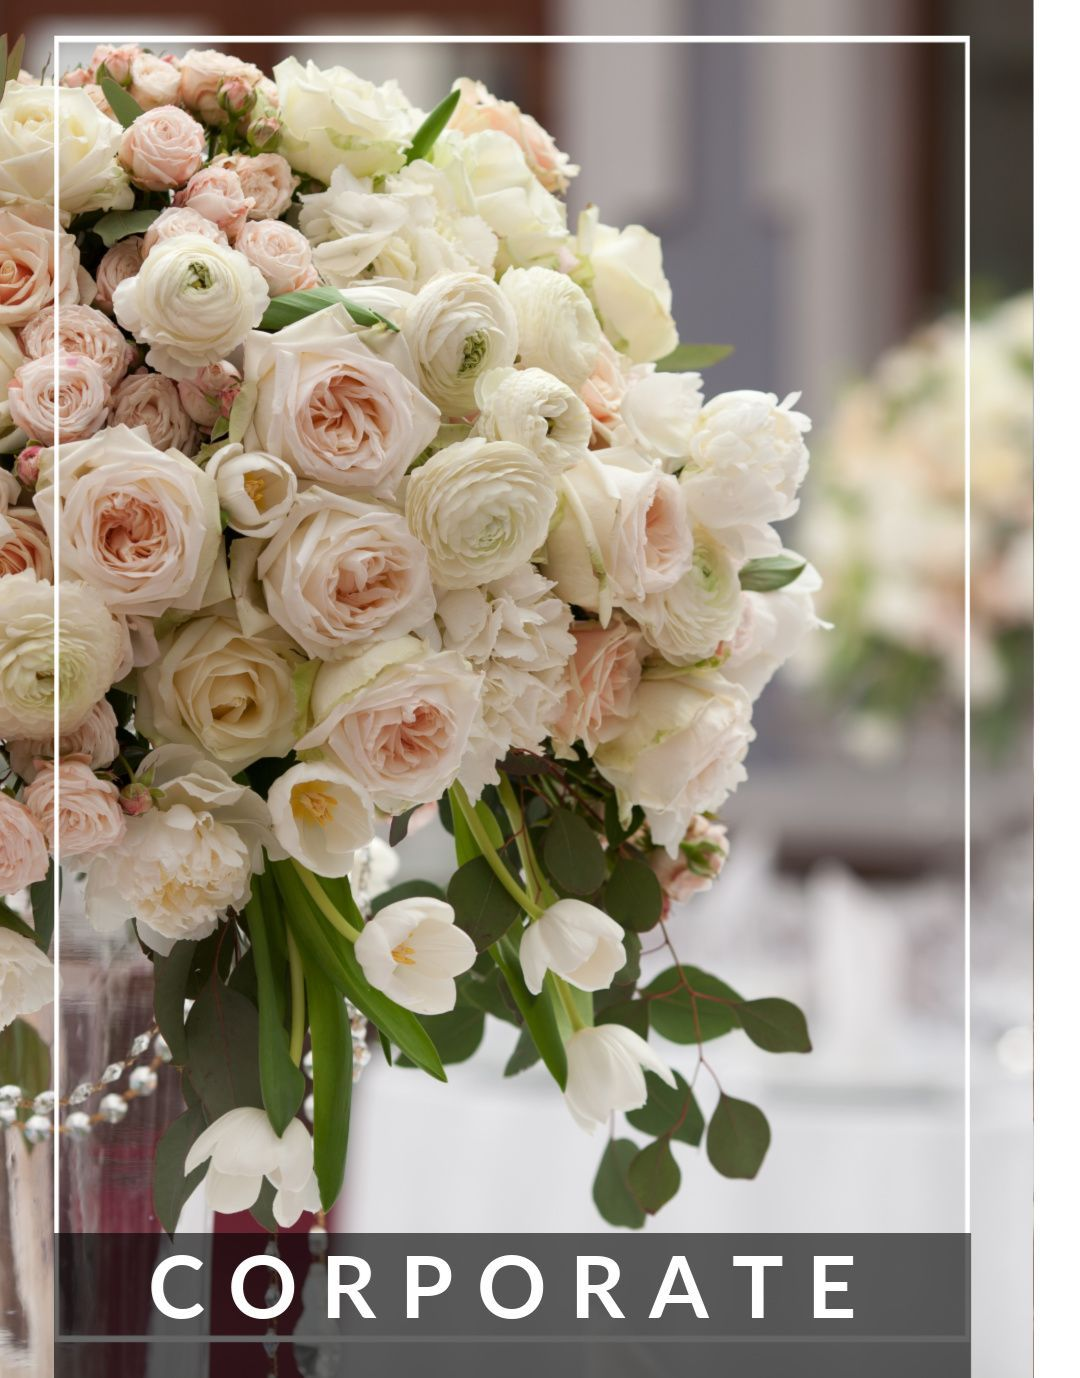 Fenton Wedding And Event Florist Savvy Floral Design Local Wedding And Events Flower Design In Fenton Mo 63026